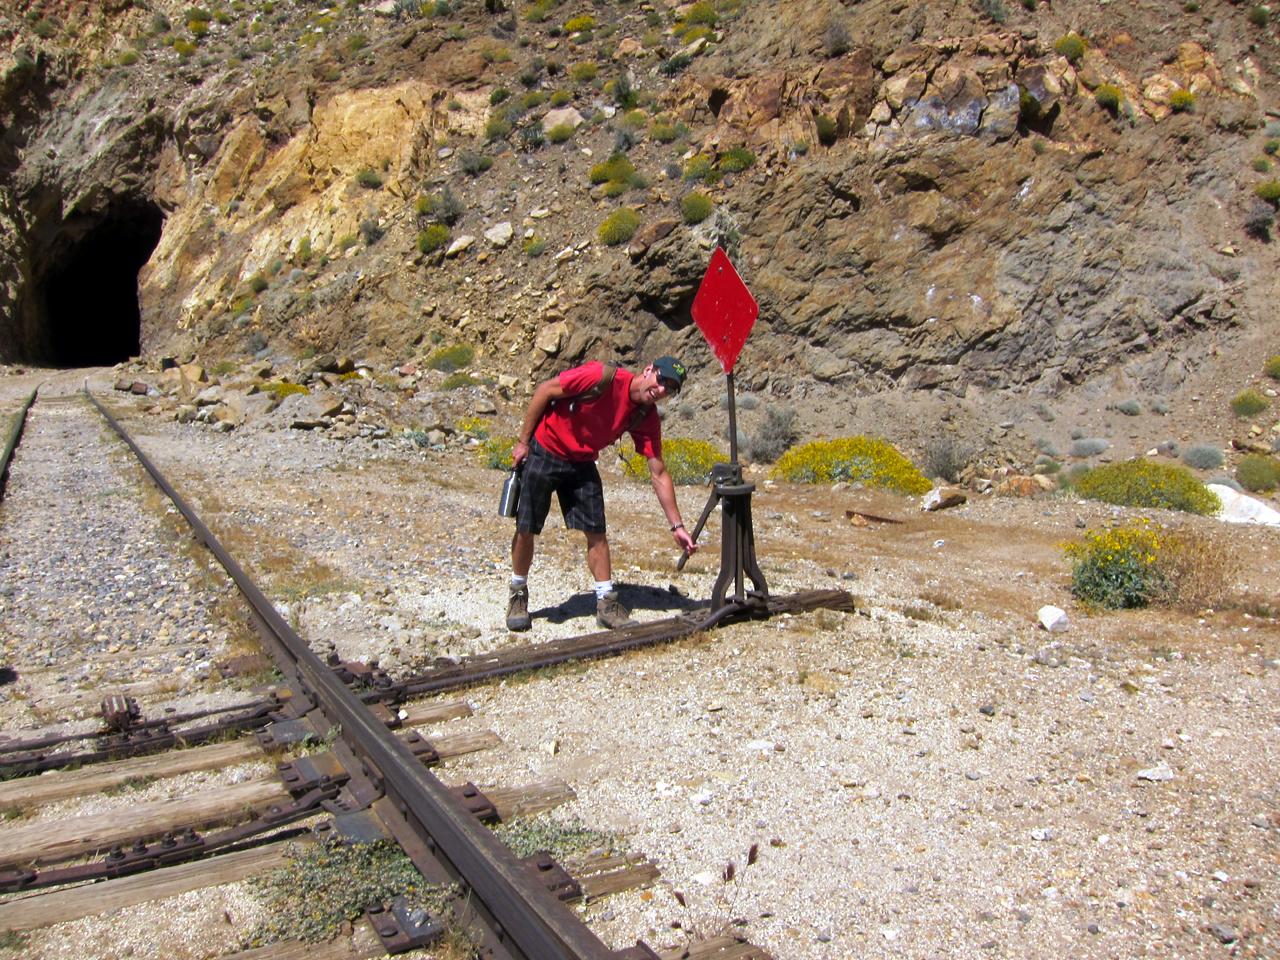 Bob playing trainman